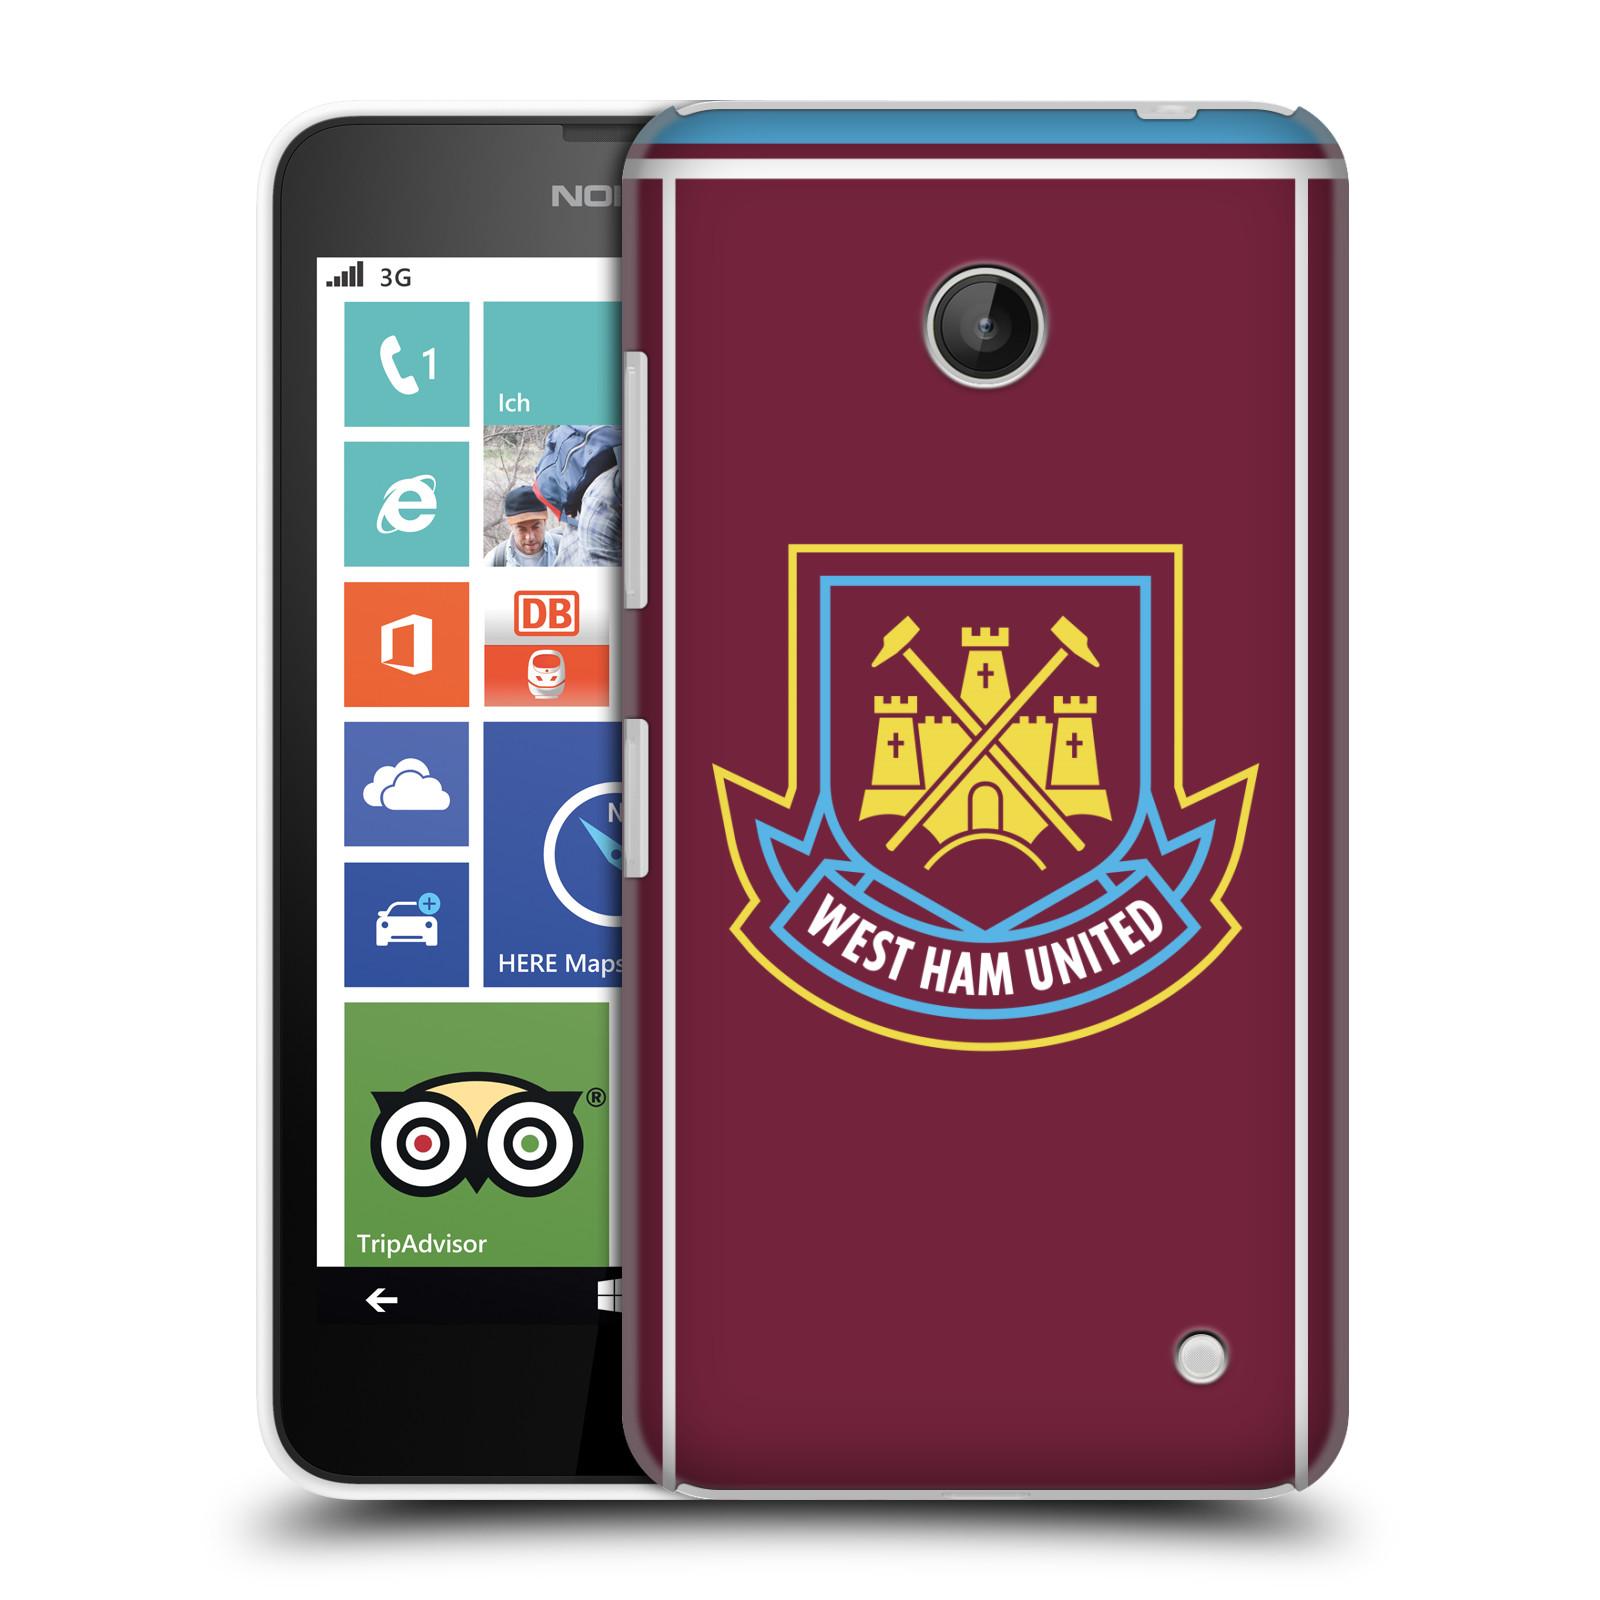 Plastové pouzdro na mobil Nokia Lumia 630 - Head Case - West Ham United - Retro znak (Plastový kryt či obal na mobilní telefon s motivem West Ham United - Kladiváři - Retro znak pro Nokia Lumia 630 a Nokia Lumia 630 Dual SIM)